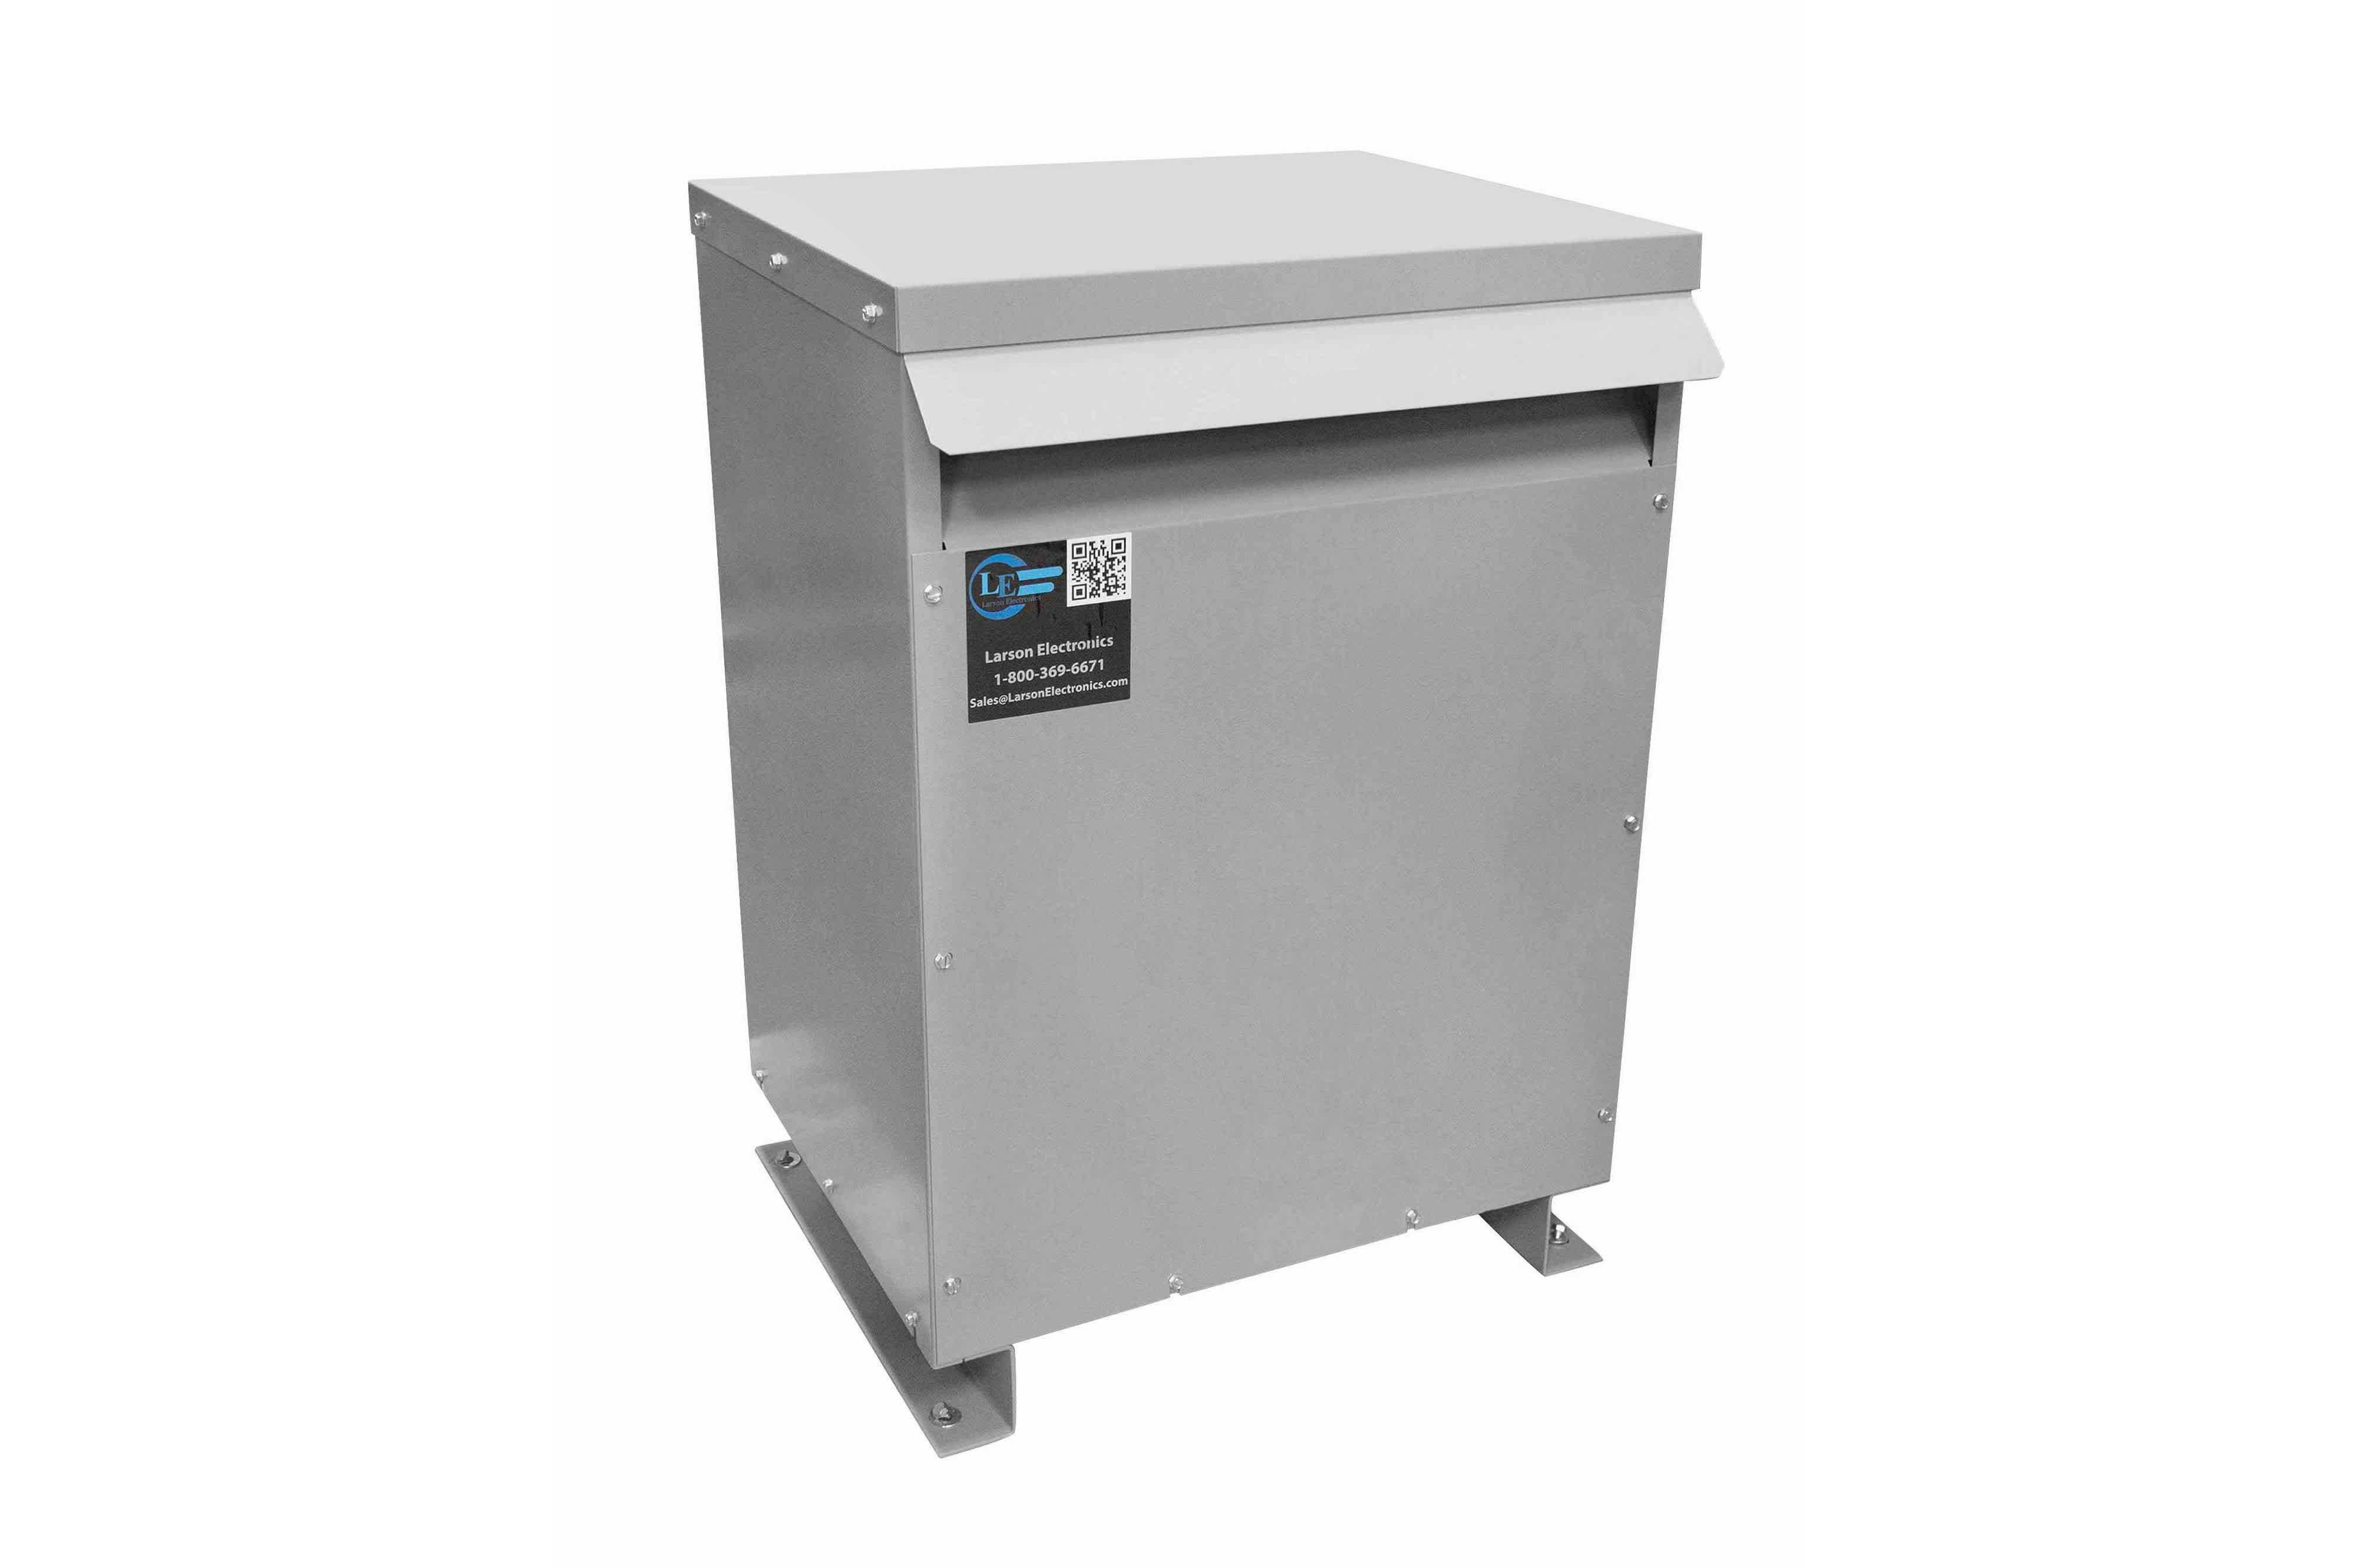 125 kVA 3PH Isolation Transformer, 208V Wye Primary, 400V Delta Secondary, N3R, Ventilated, 60 Hz